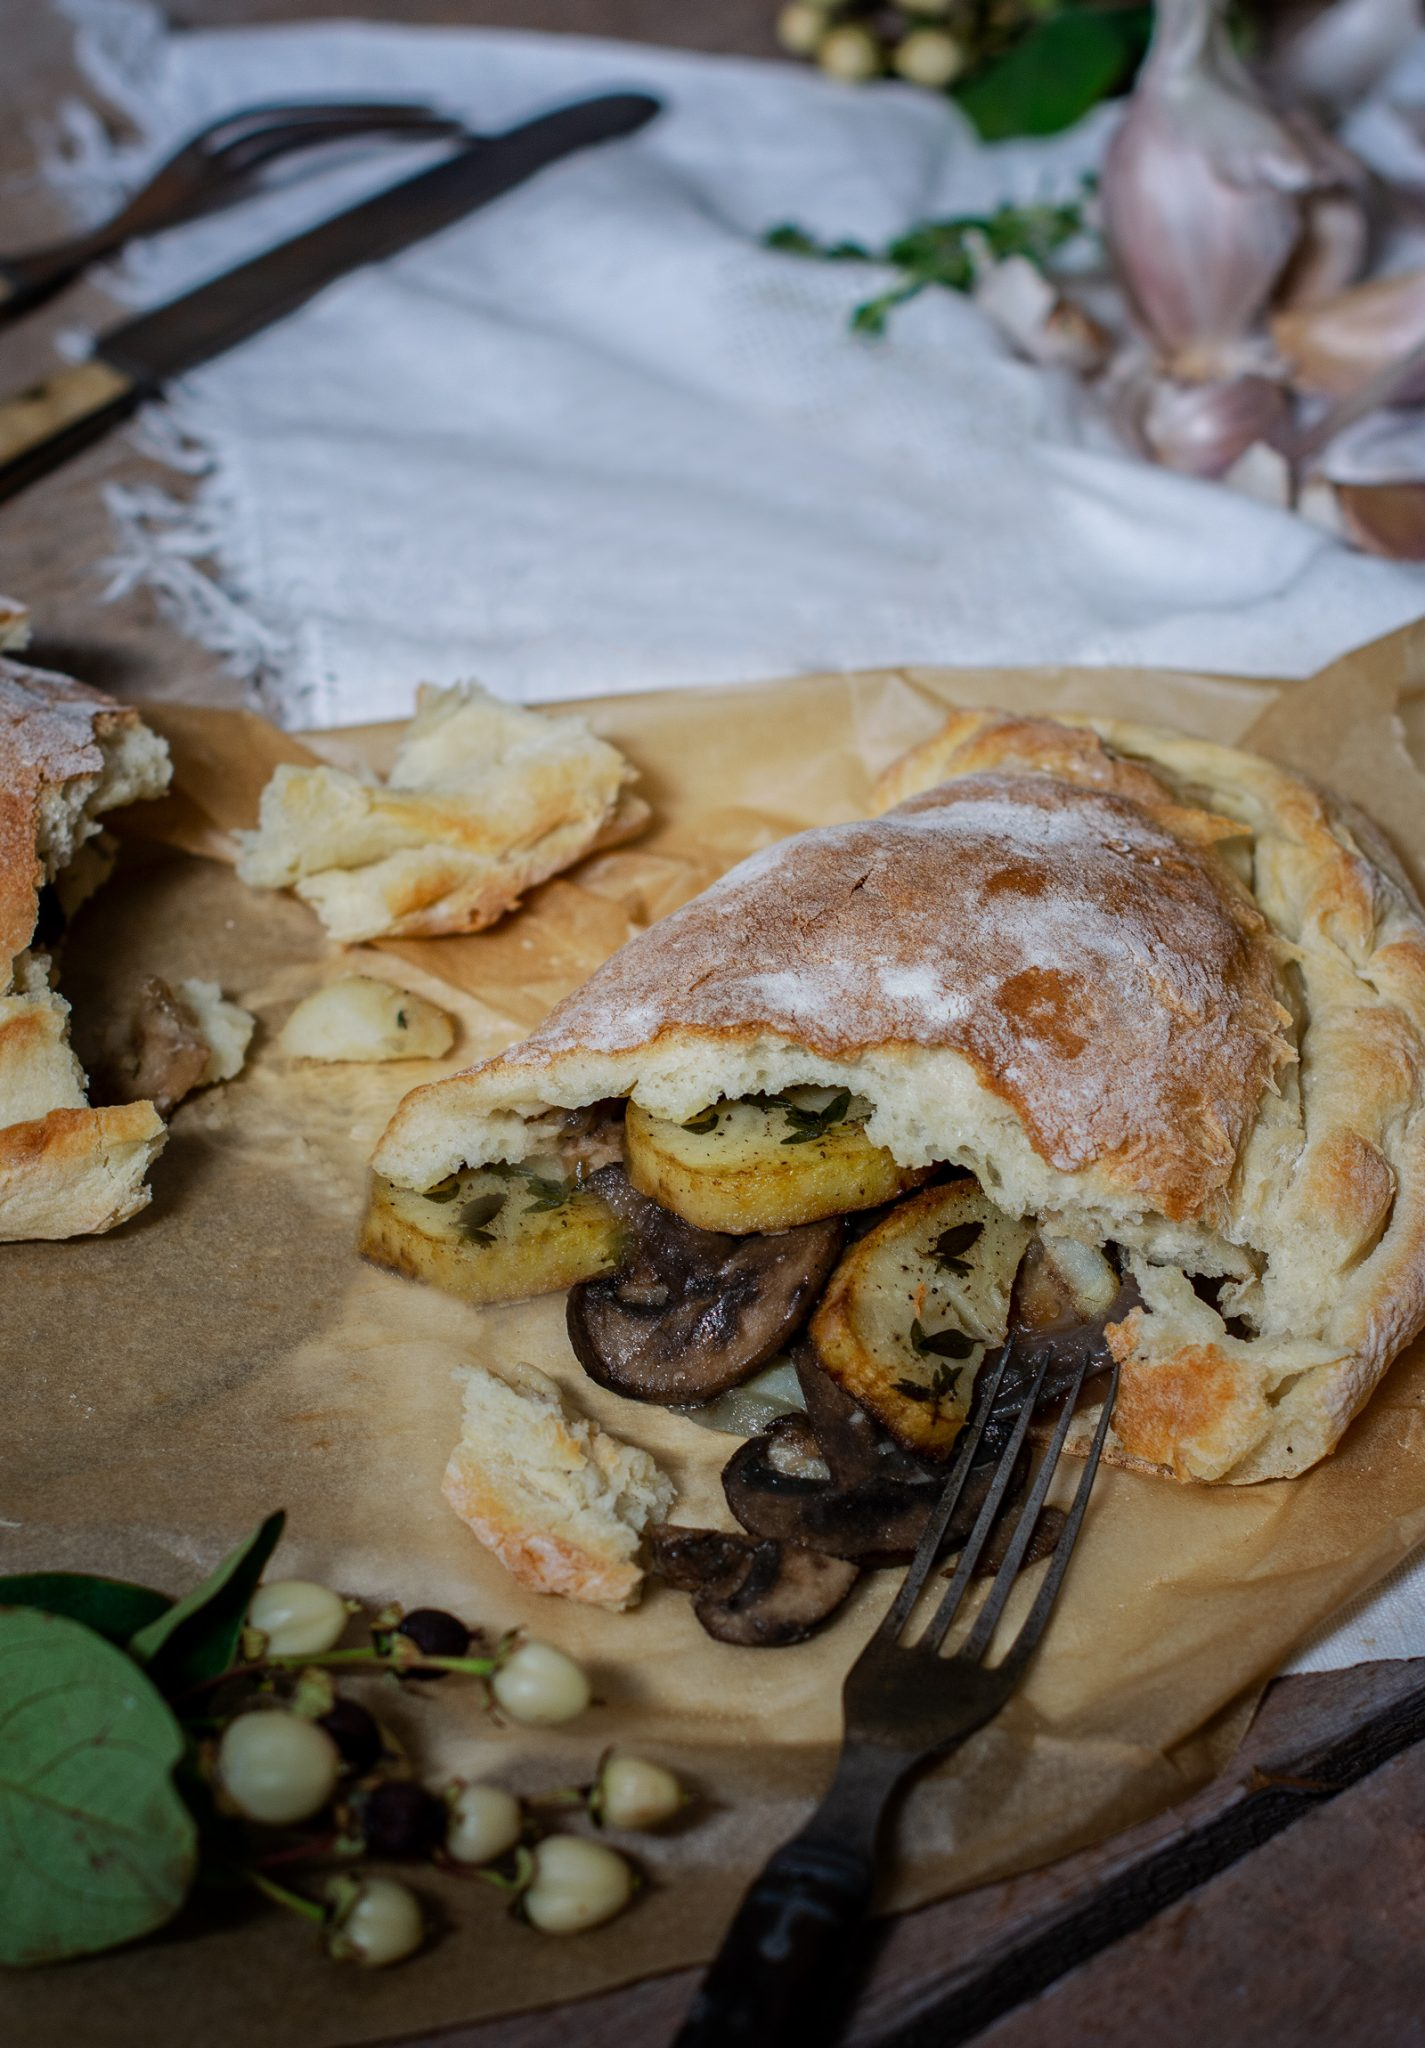 Mushrooms, Onions, Garlic, Potato Calzone Recipe ready to enjoy.